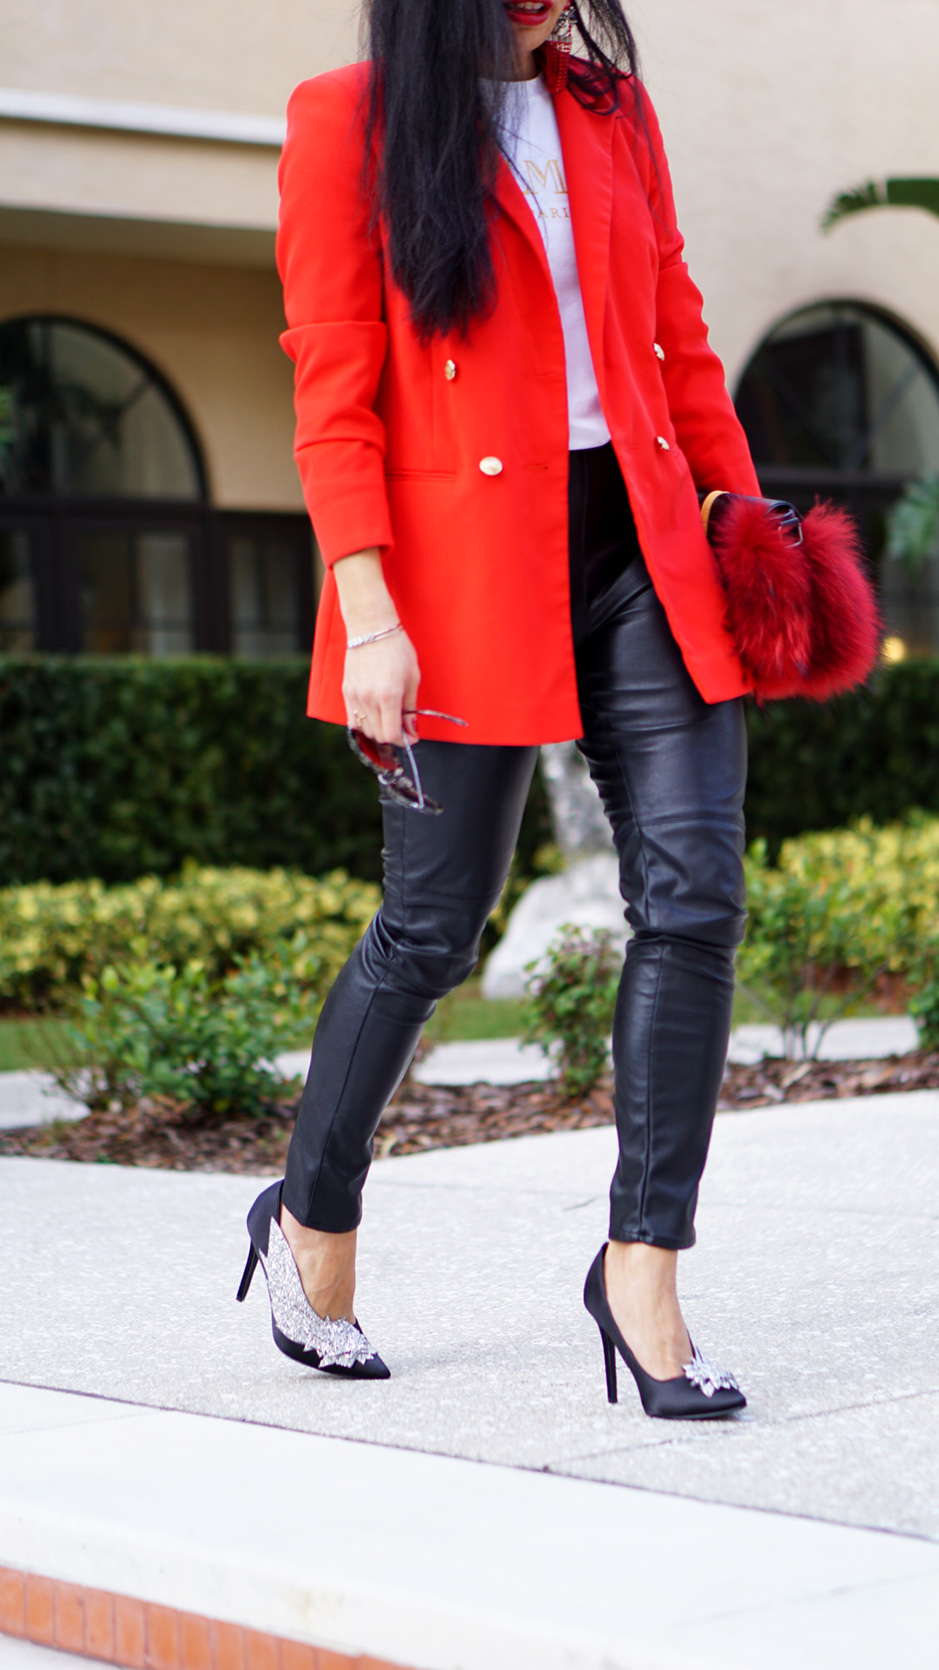 Easy Ways to Add Color to Your Wardrobe #fashiontips #outfitinspiration #redoutfit #redblazer #fashionblog #fashionblogger #styleinspiration #outfitinspo #crystalheels #runwaystyle #boyfriendblazer #streetstyle #streetstyleinspo #streetstyleinspiration #styleinspiration #outfitdetails #shopthelook #Furbag #balmain #tshirt #stylish #nakd #zara #asos